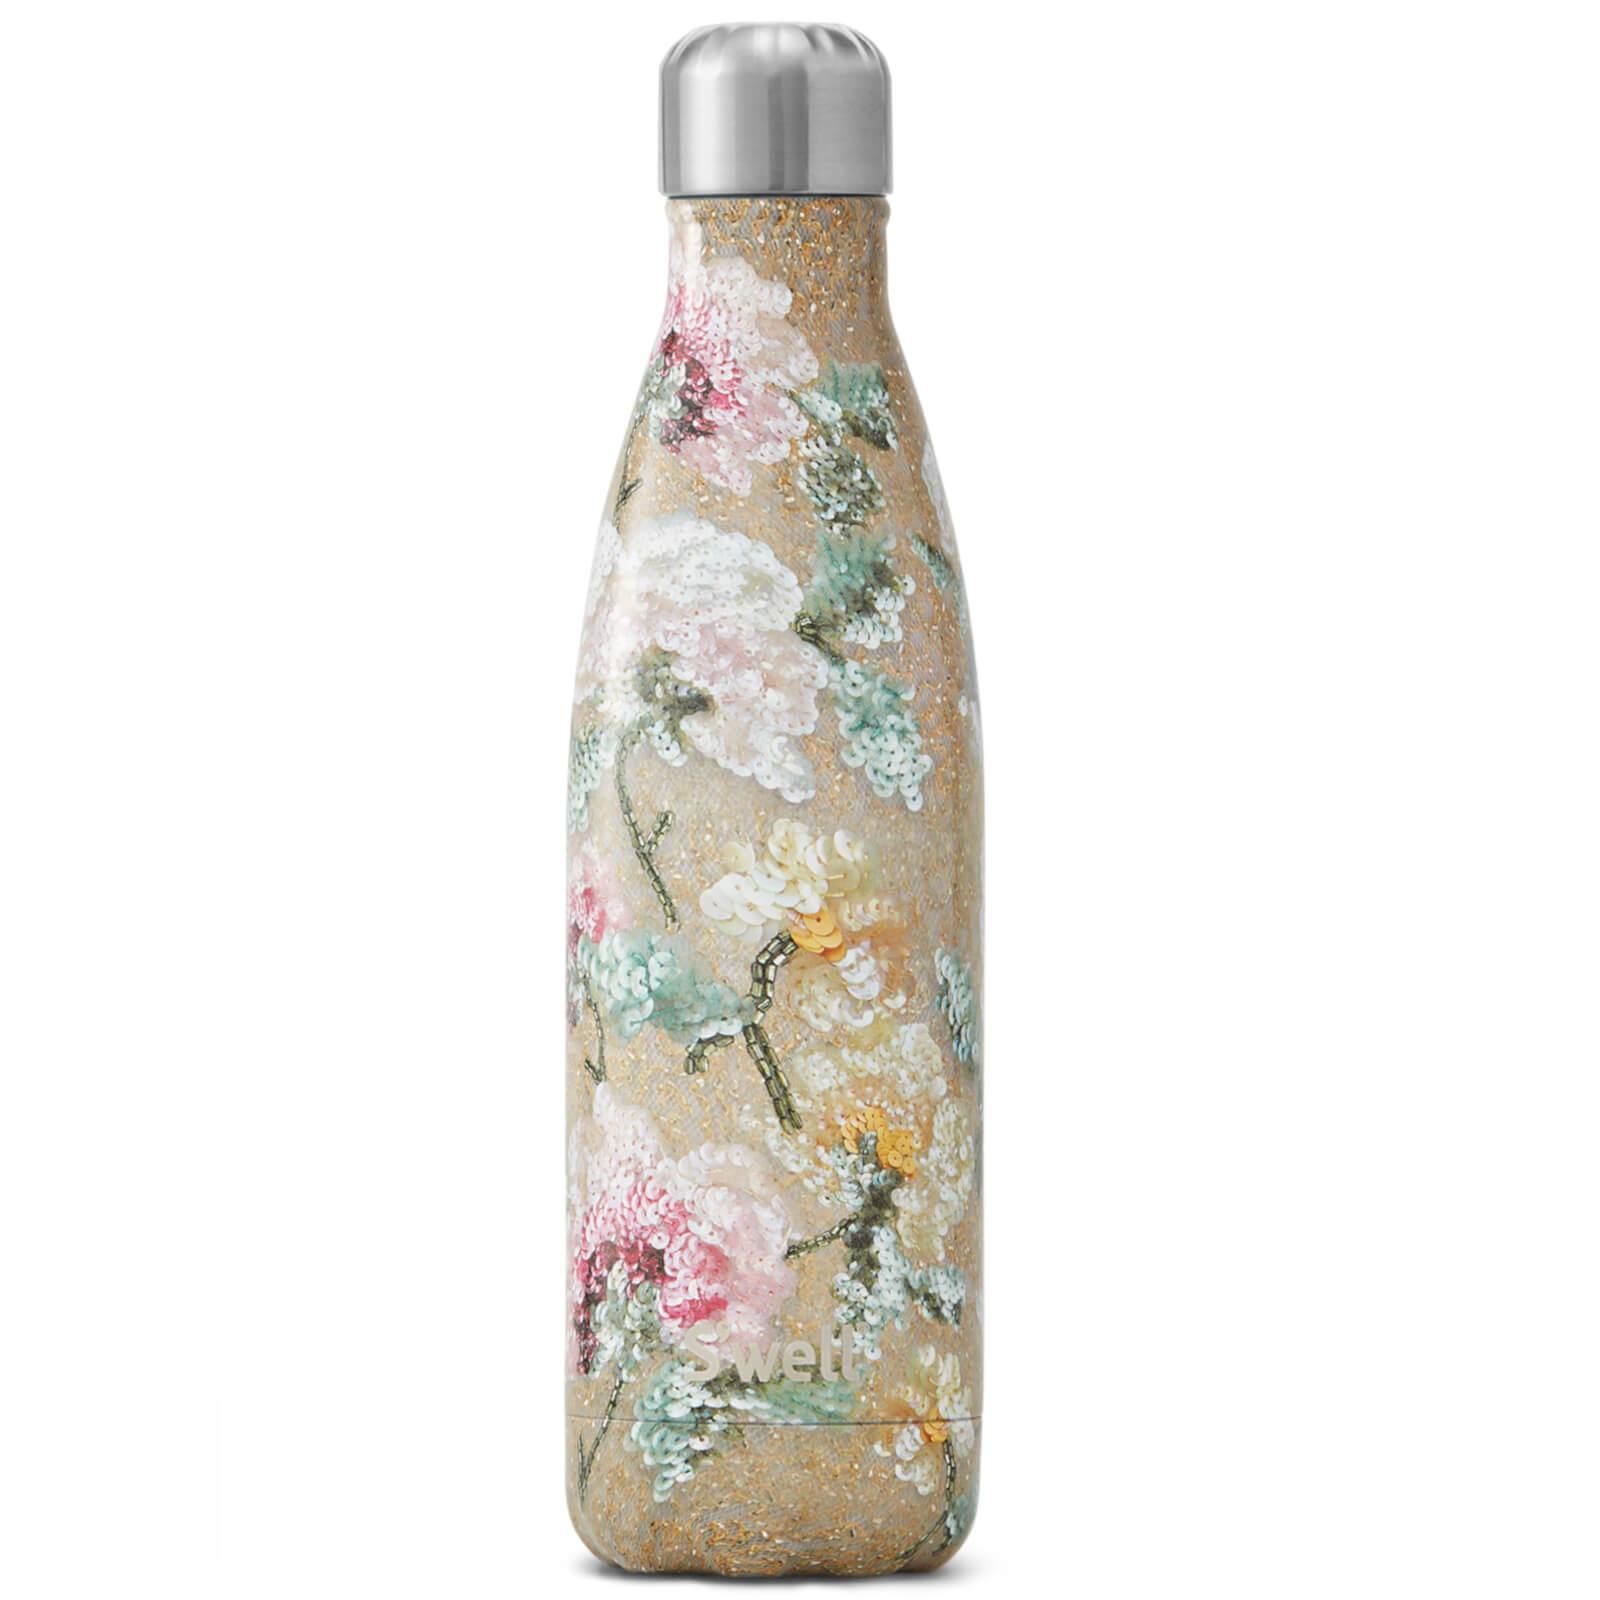 S'well Sequin Vintage Rose Water Bottle - 500ml